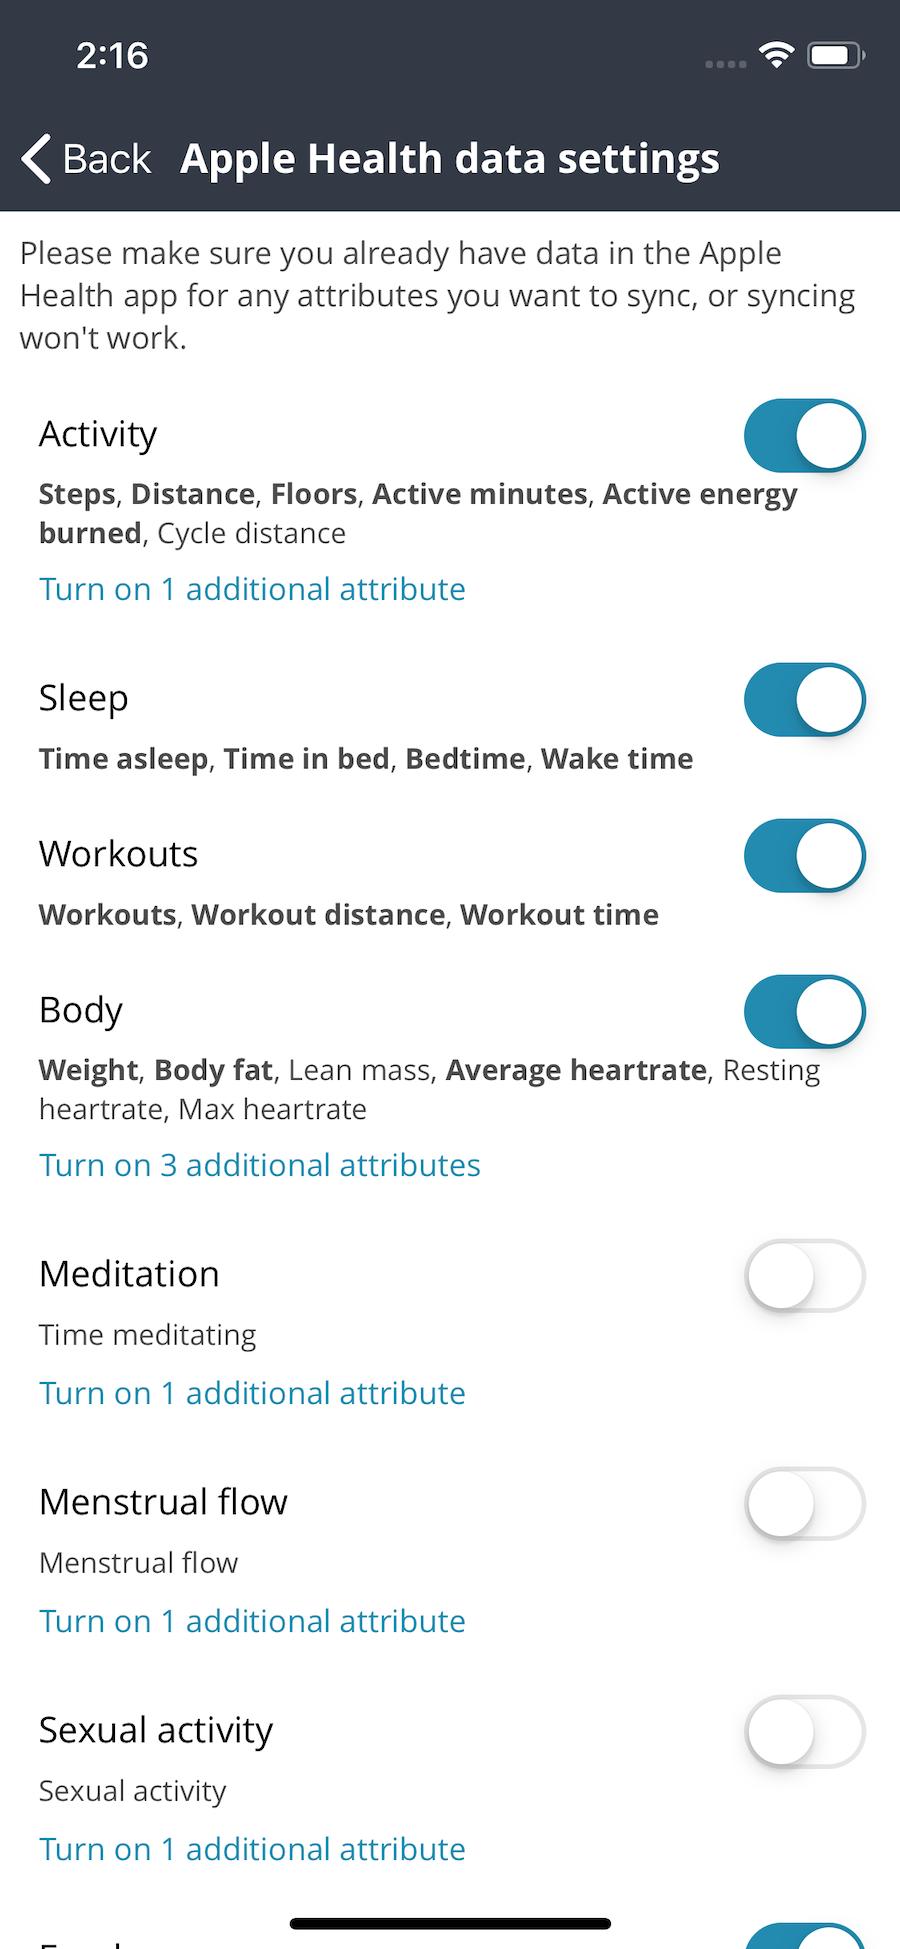 Apple Health settings screen